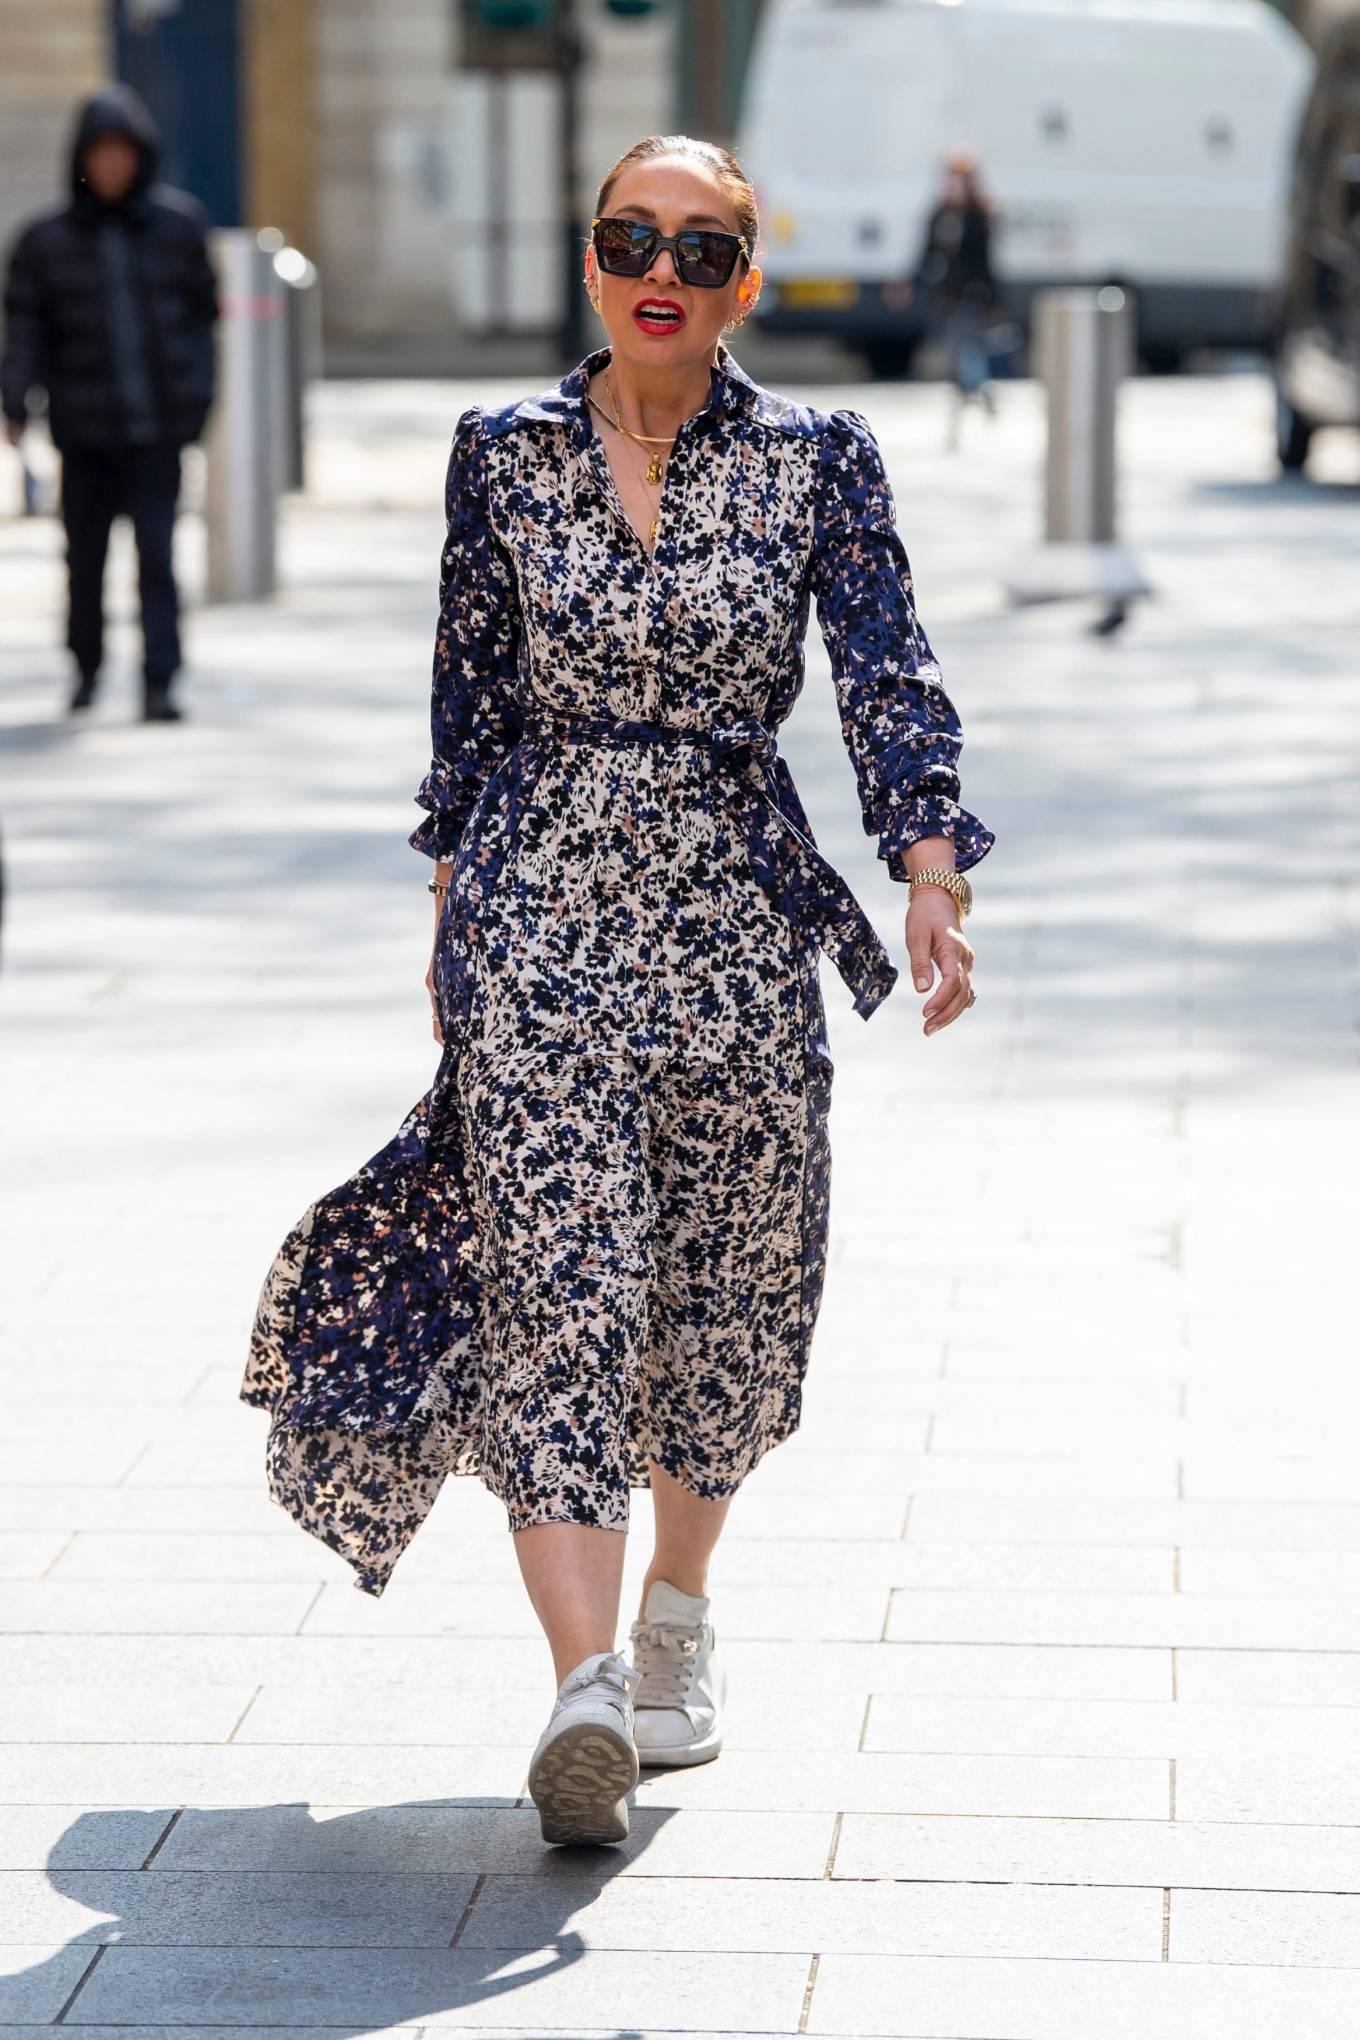 Myleene Klass 2021 : Myleene Klass – In a long summer dress arriving at the Global studios -06